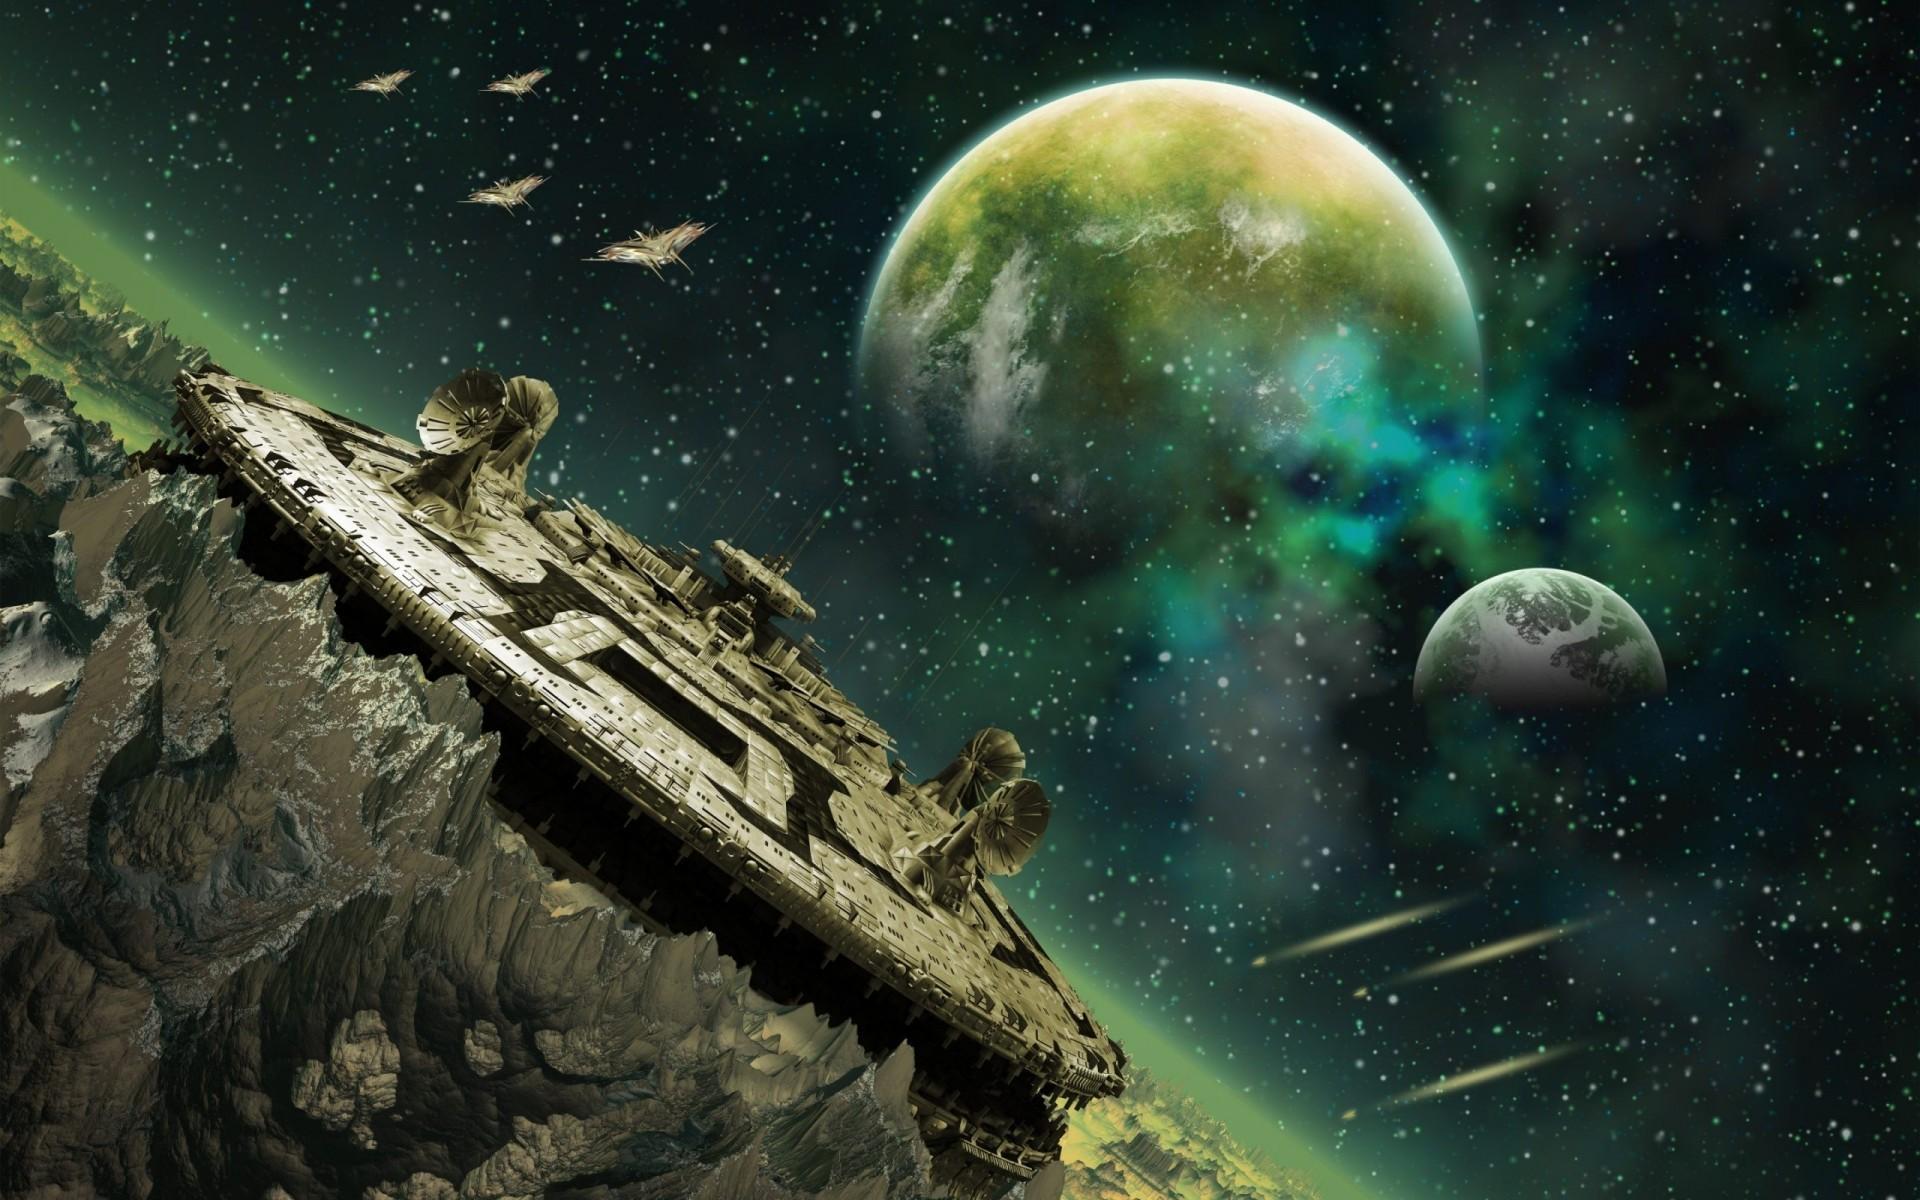 Alien Planet Space Station Wallpaper